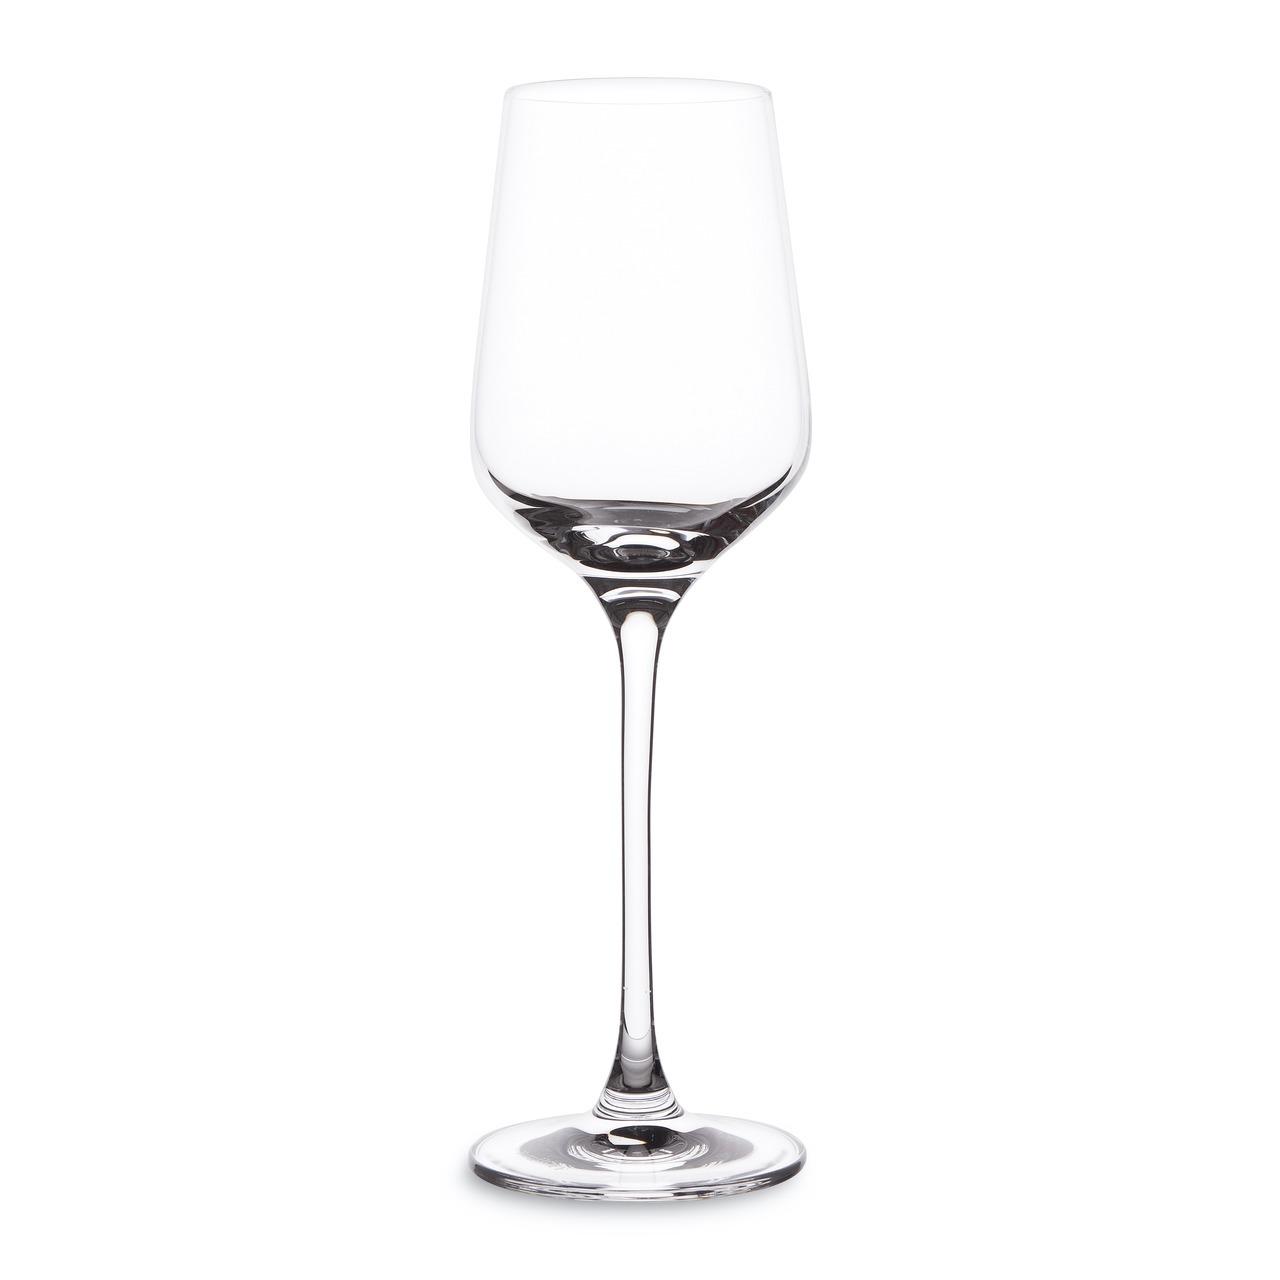 Набор из 6 бокалов для белого вина 250мл BergHOFF Chateau 1701600Бокалы и стаканы<br><br>